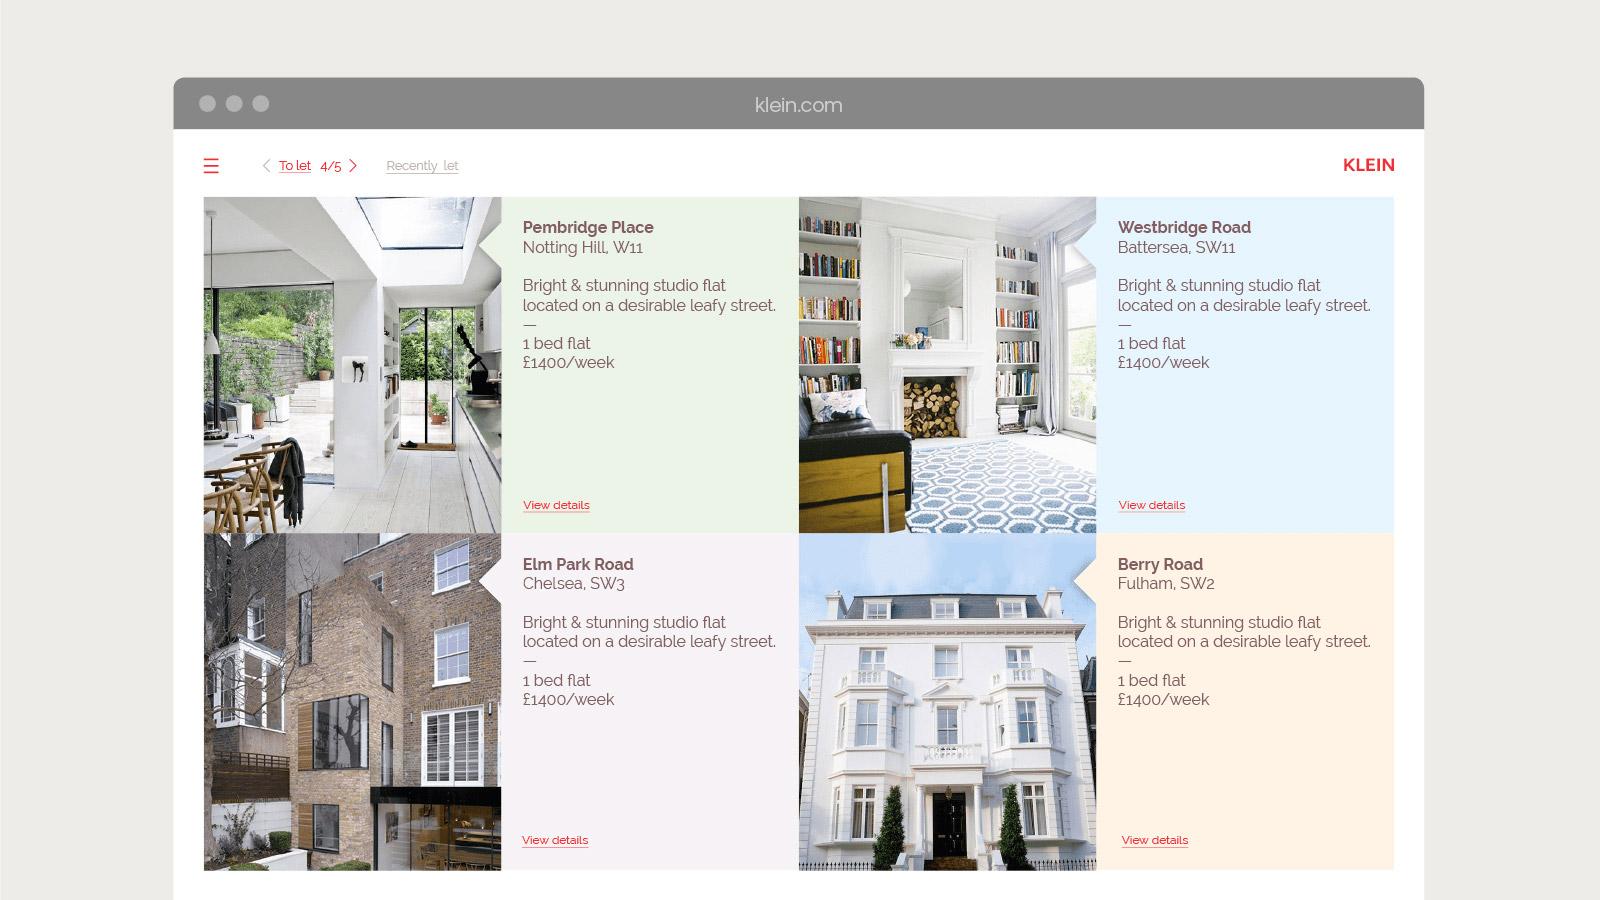 property-agency-visual-branding-identity-design-milton-keynes-london-14